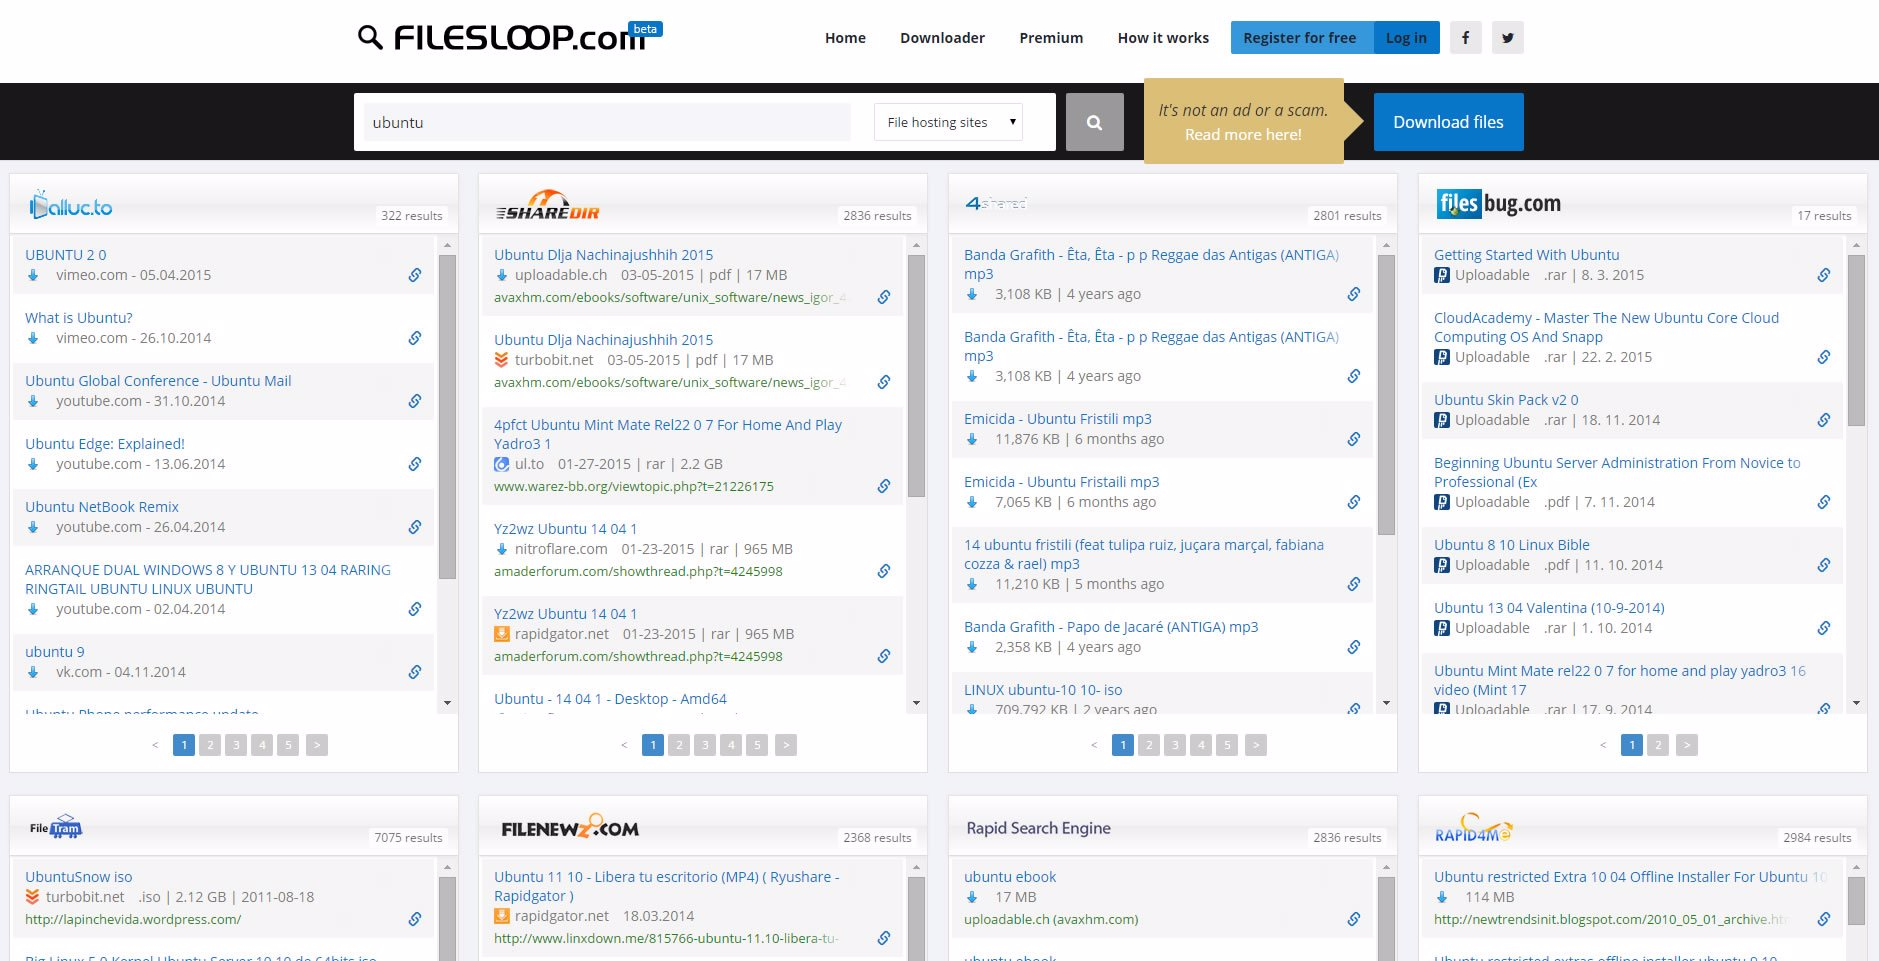 FilesLoop.com